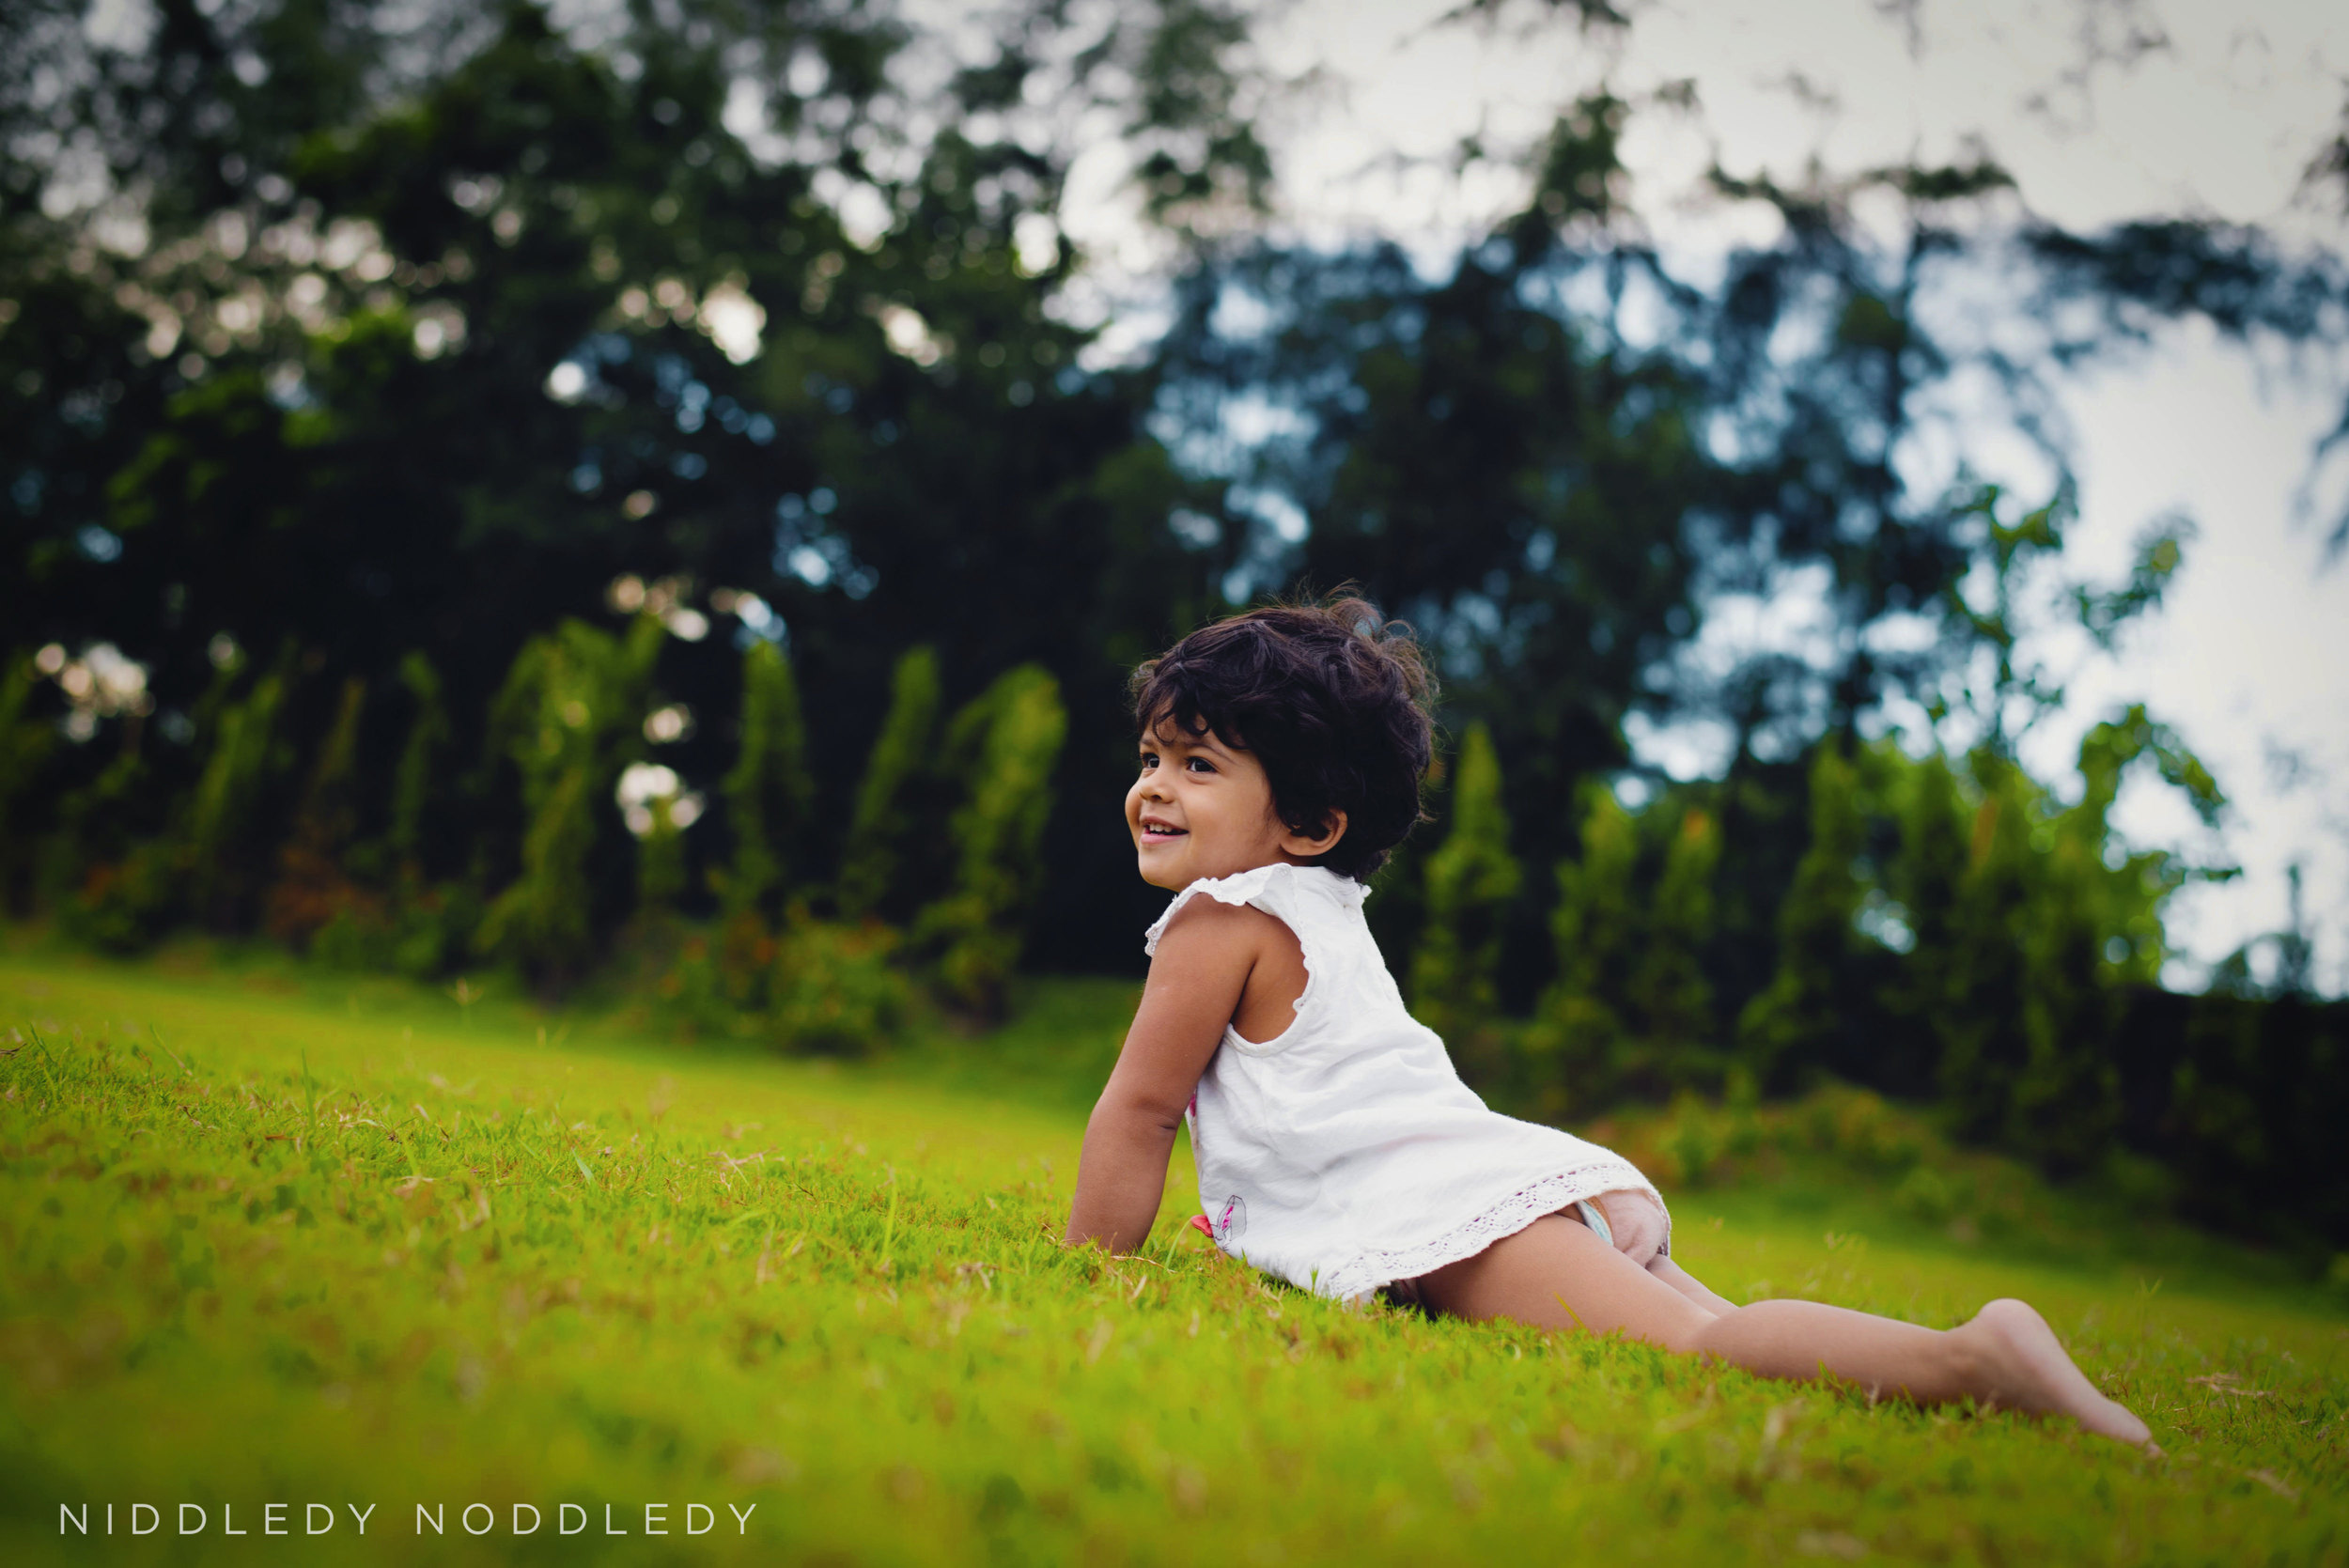 Best Photographer ❤ NiddledyNoddledy.com ~ Prenatal, Newborn and Child Photography, Calcutta - 12.jpg